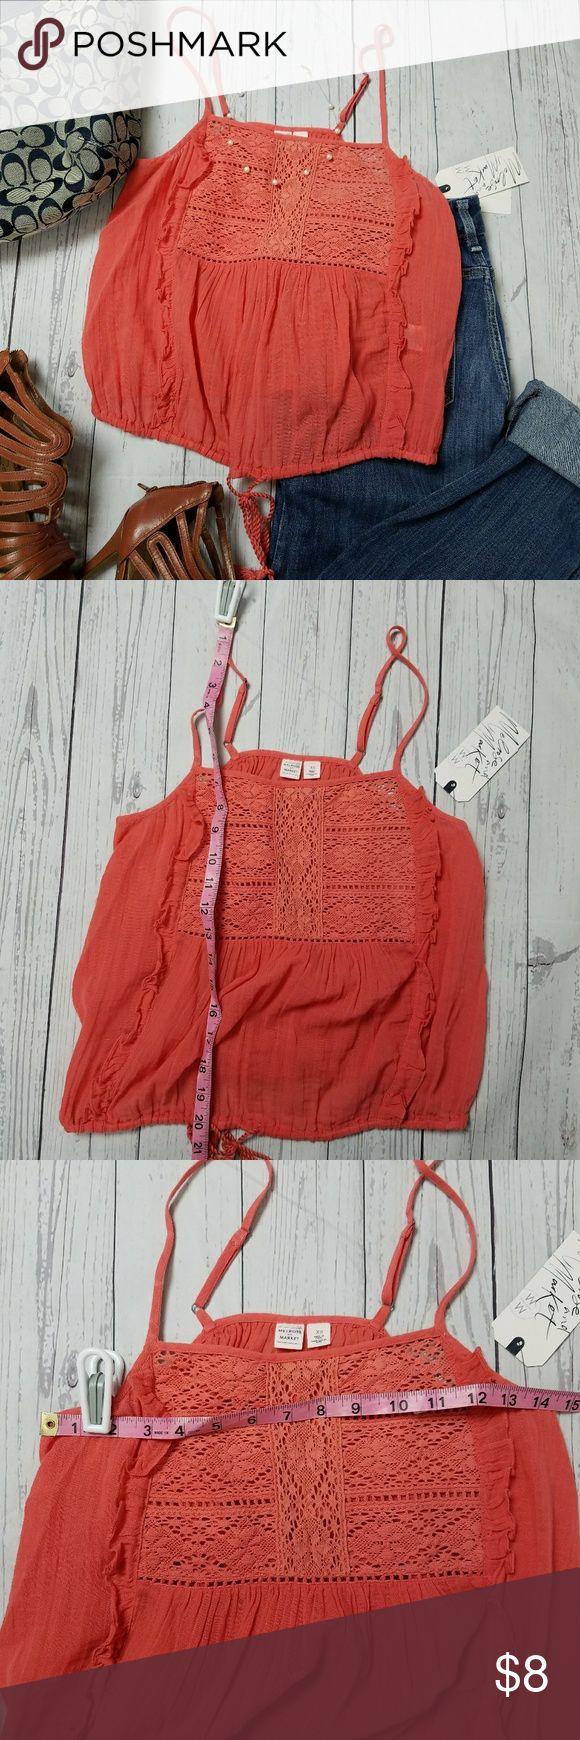 NWT Melrose and Market Crochet Yoke Cami NWT Melrose and Market Crochet Yoke Cami Coral Spice Melrose and Market Tops